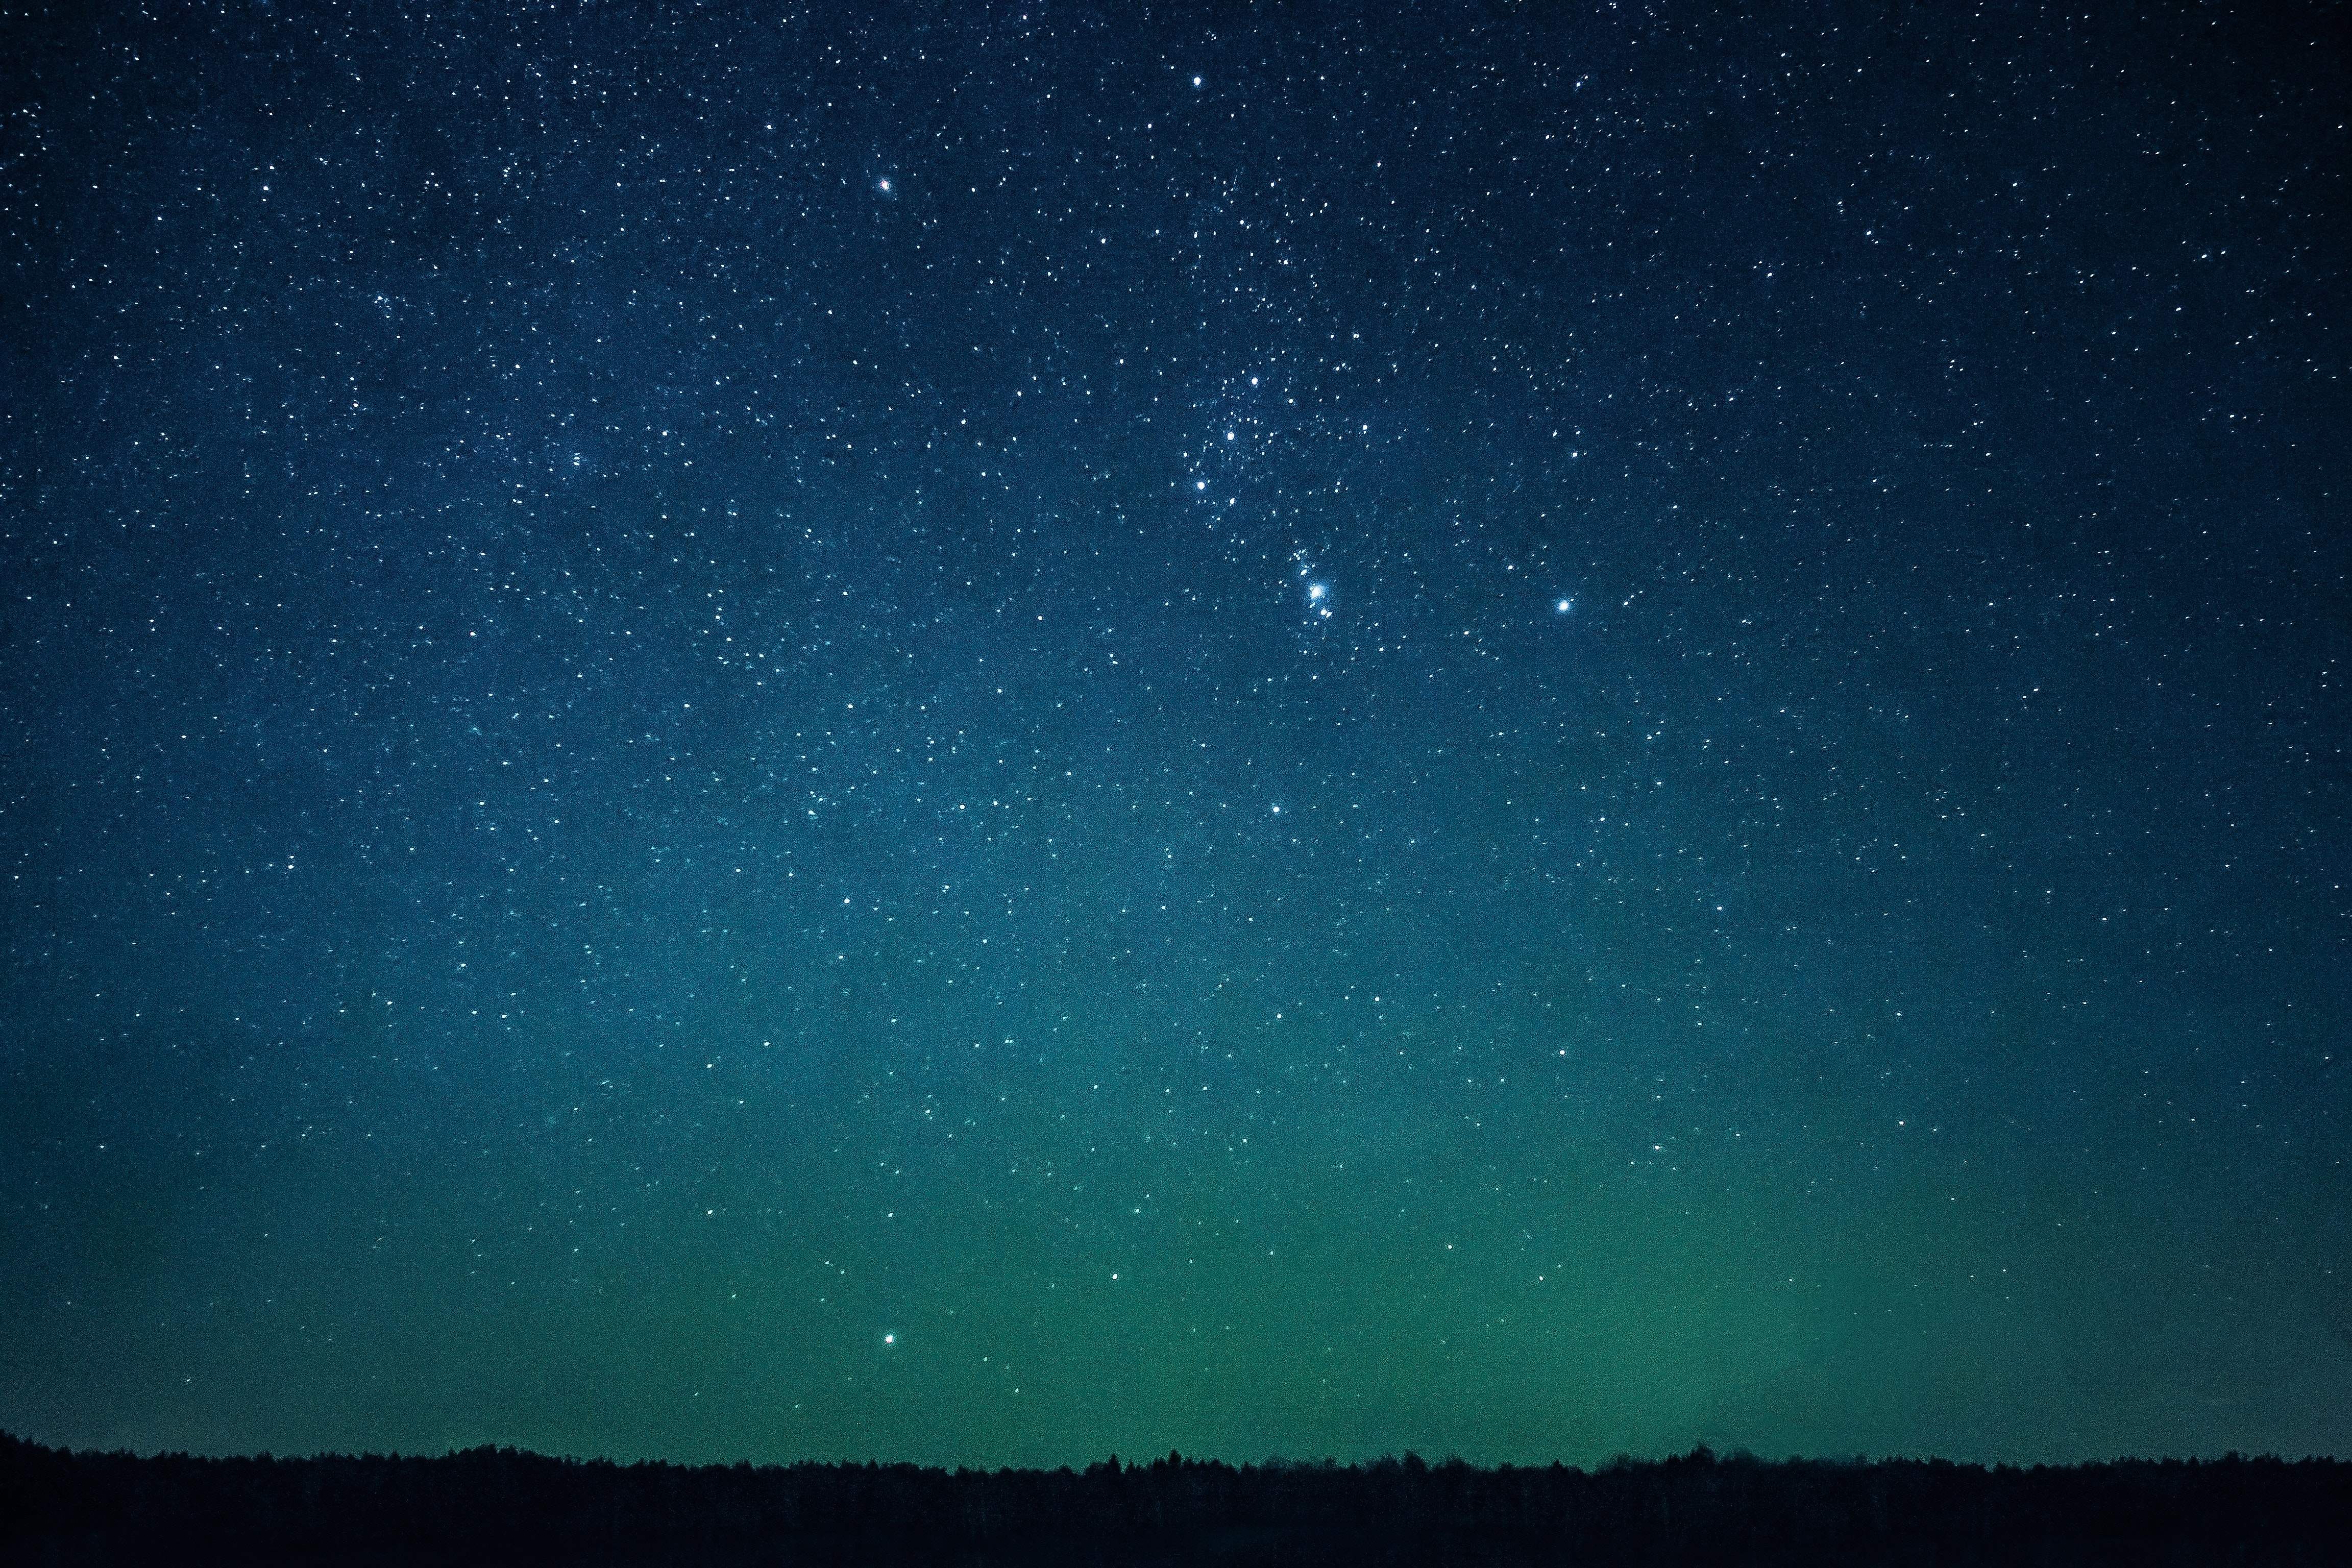 Stars in night sky photo